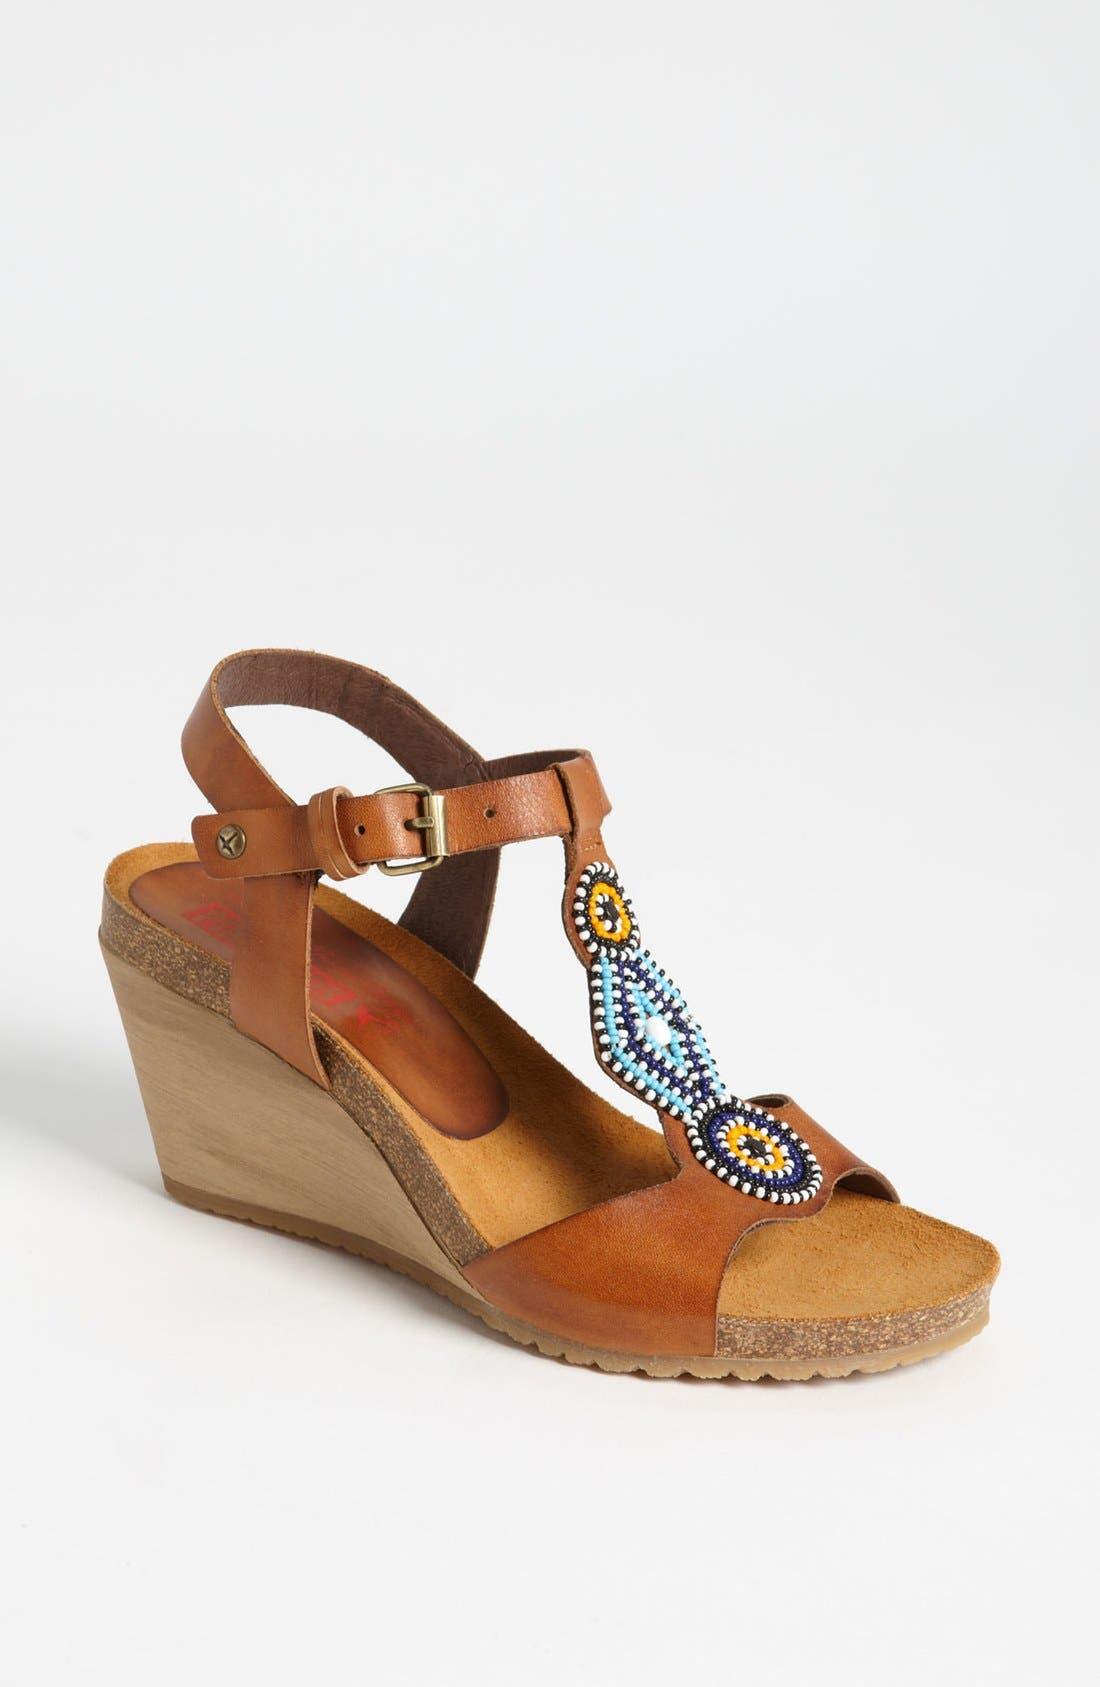 Alternate Image 1 Selected - PIKOLINOS 'Benissa Maasai 1' Sandal